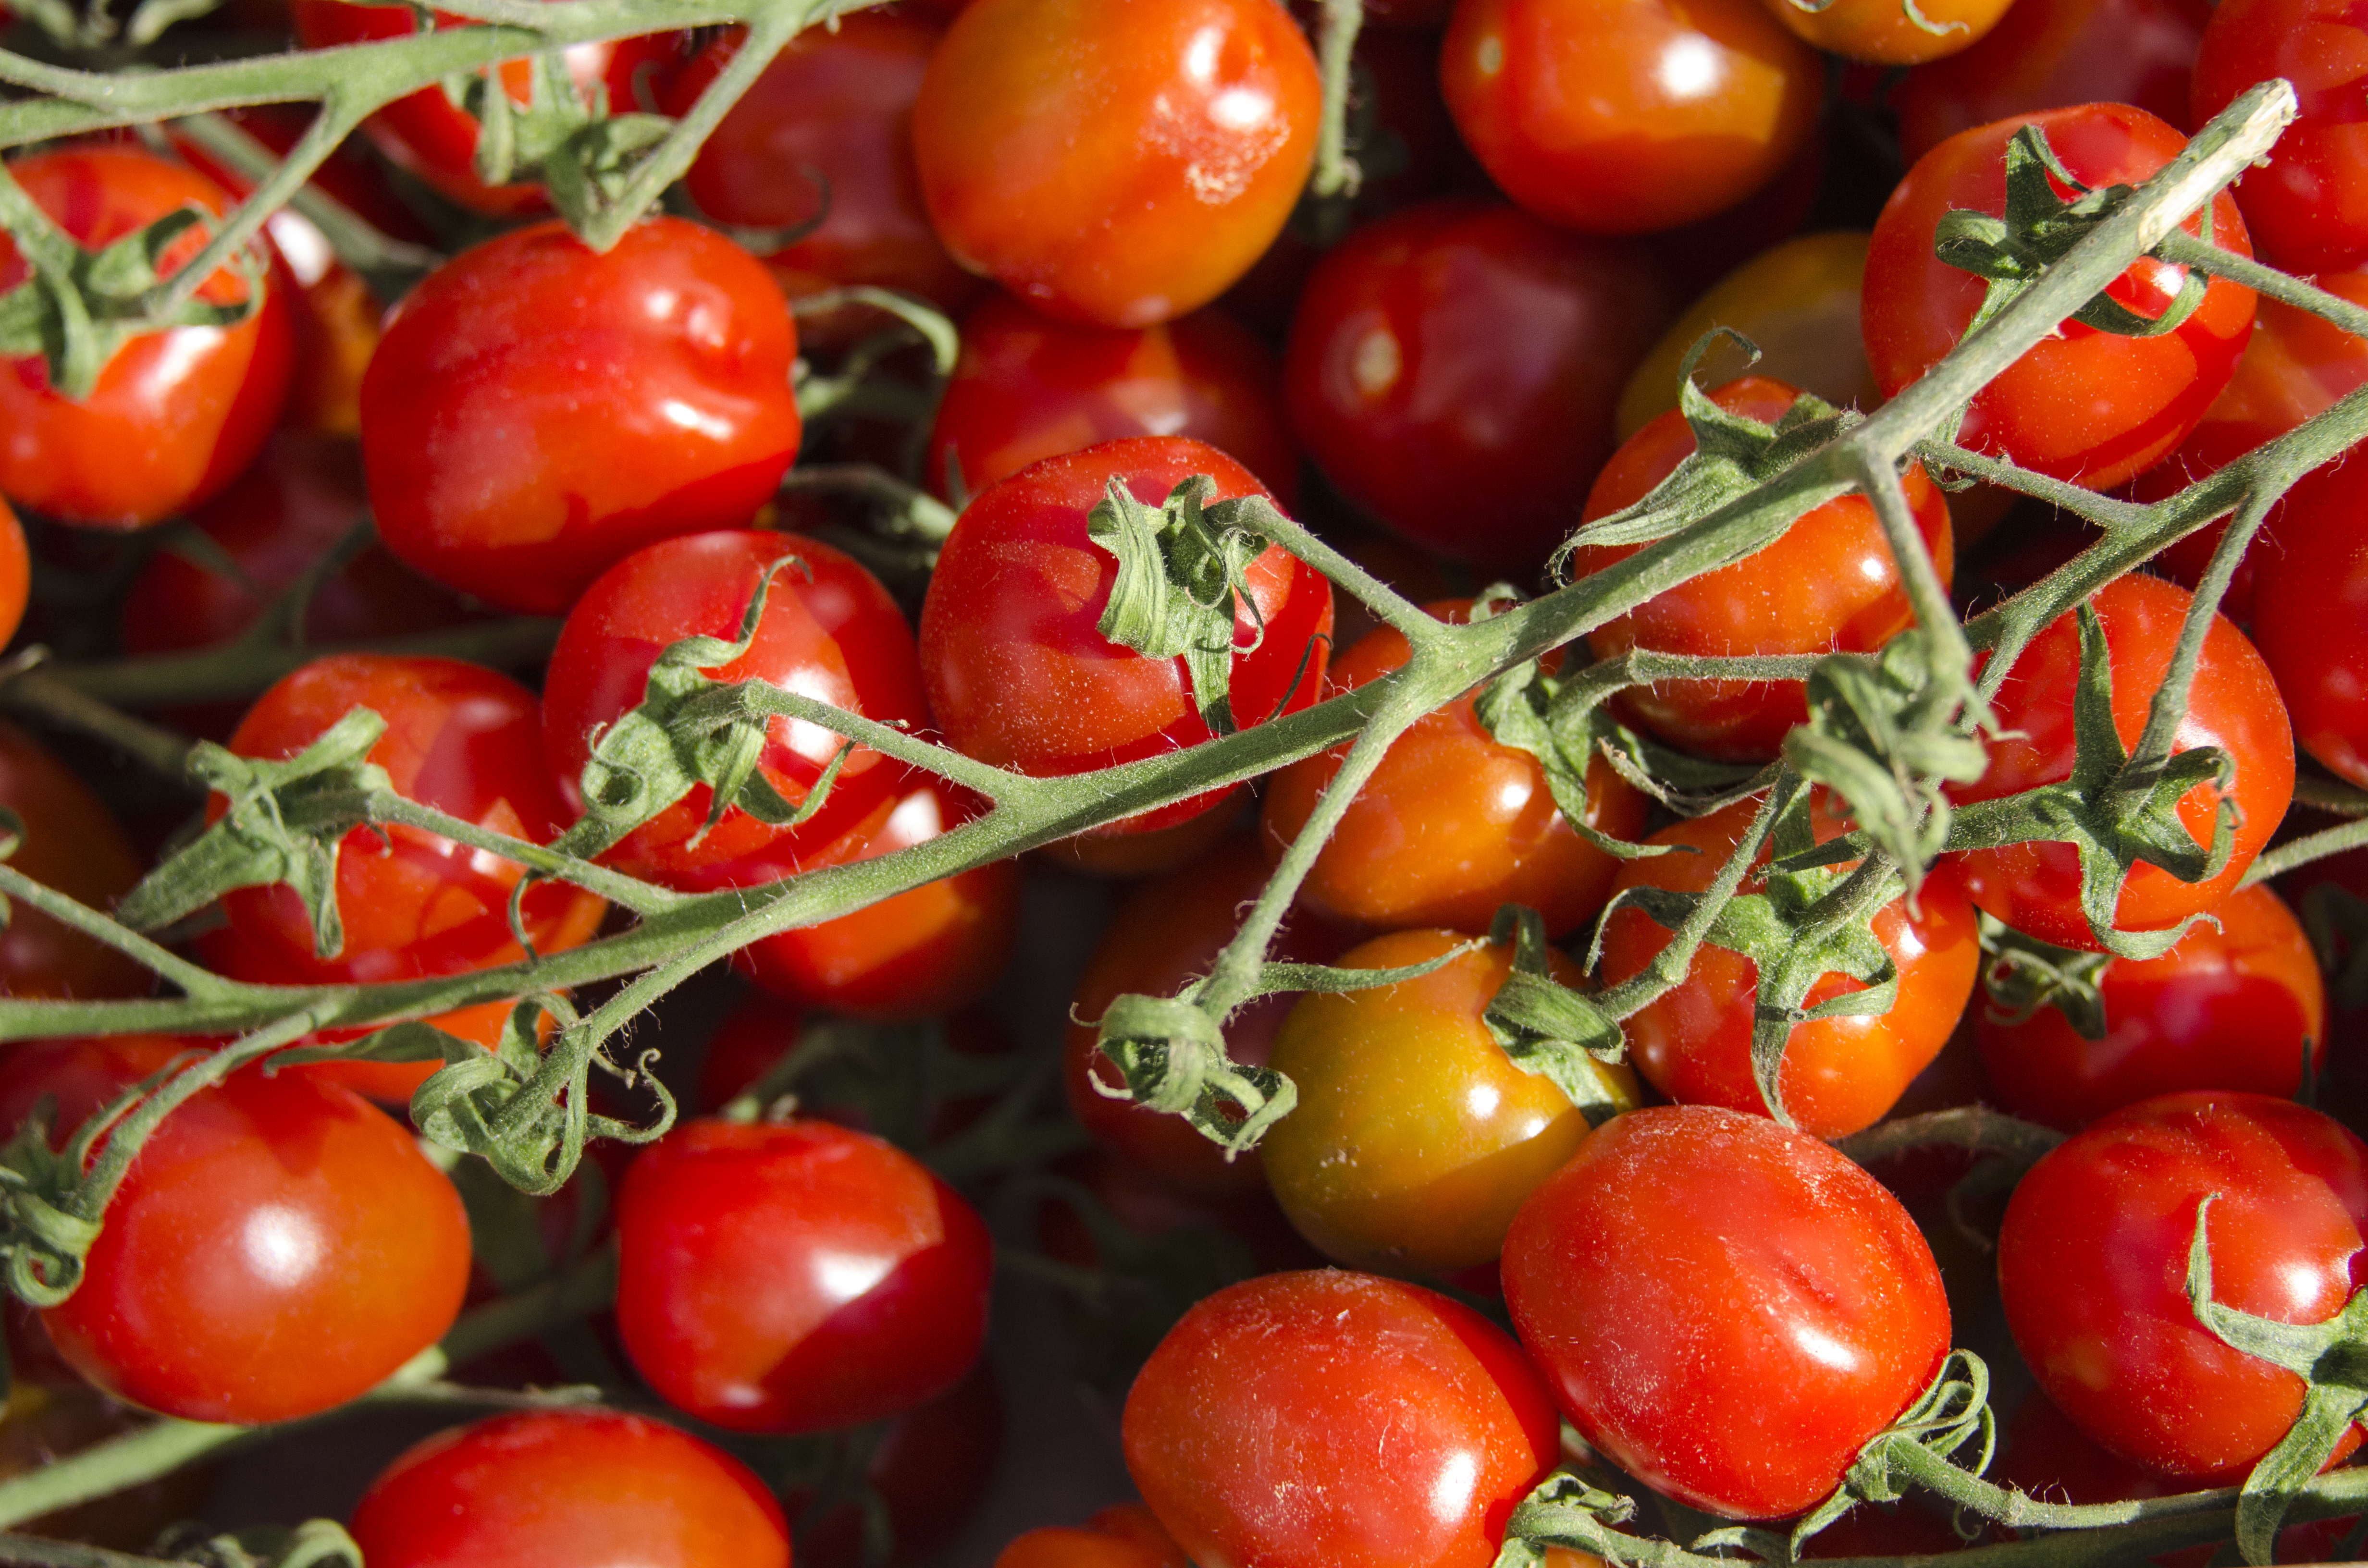 Horiz Tomatoes - JP - 12-05-2013